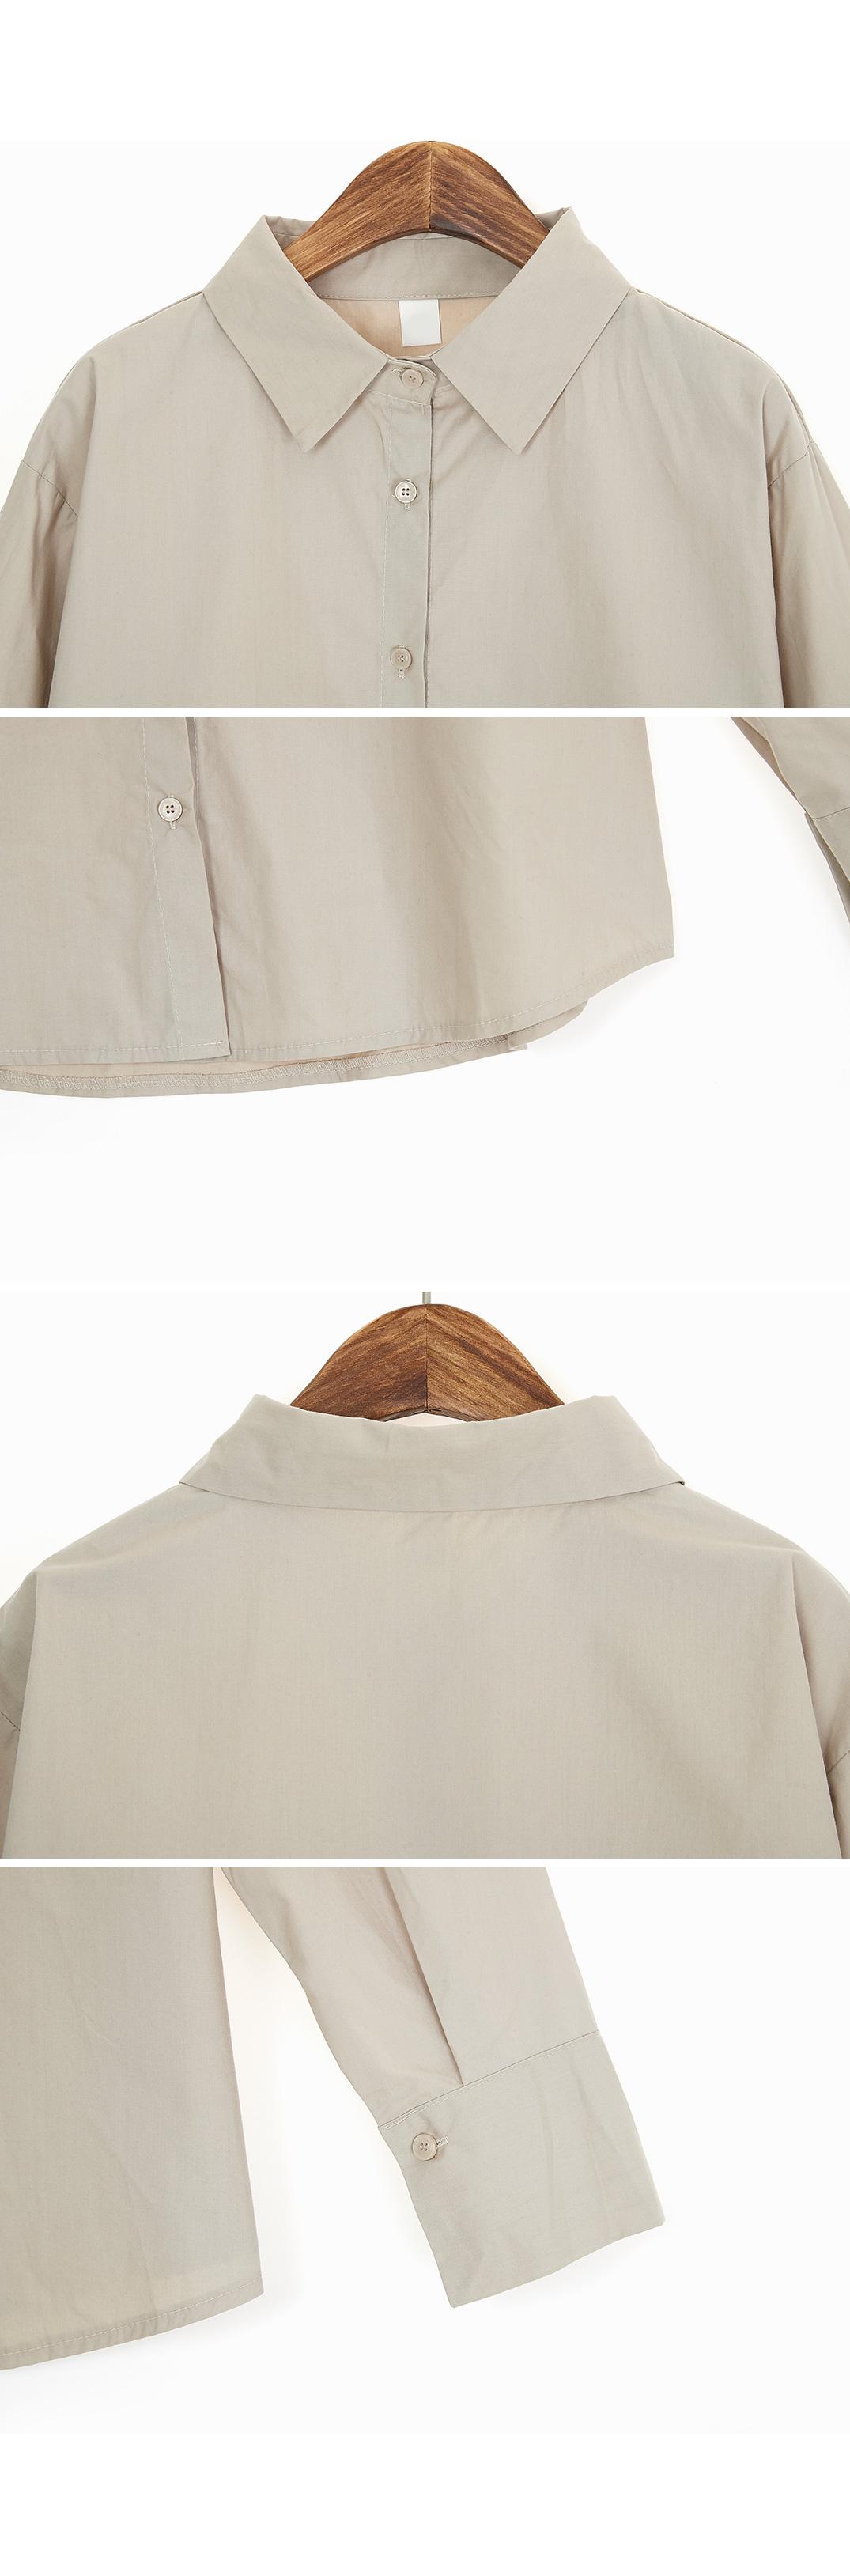 Urban simple shirt